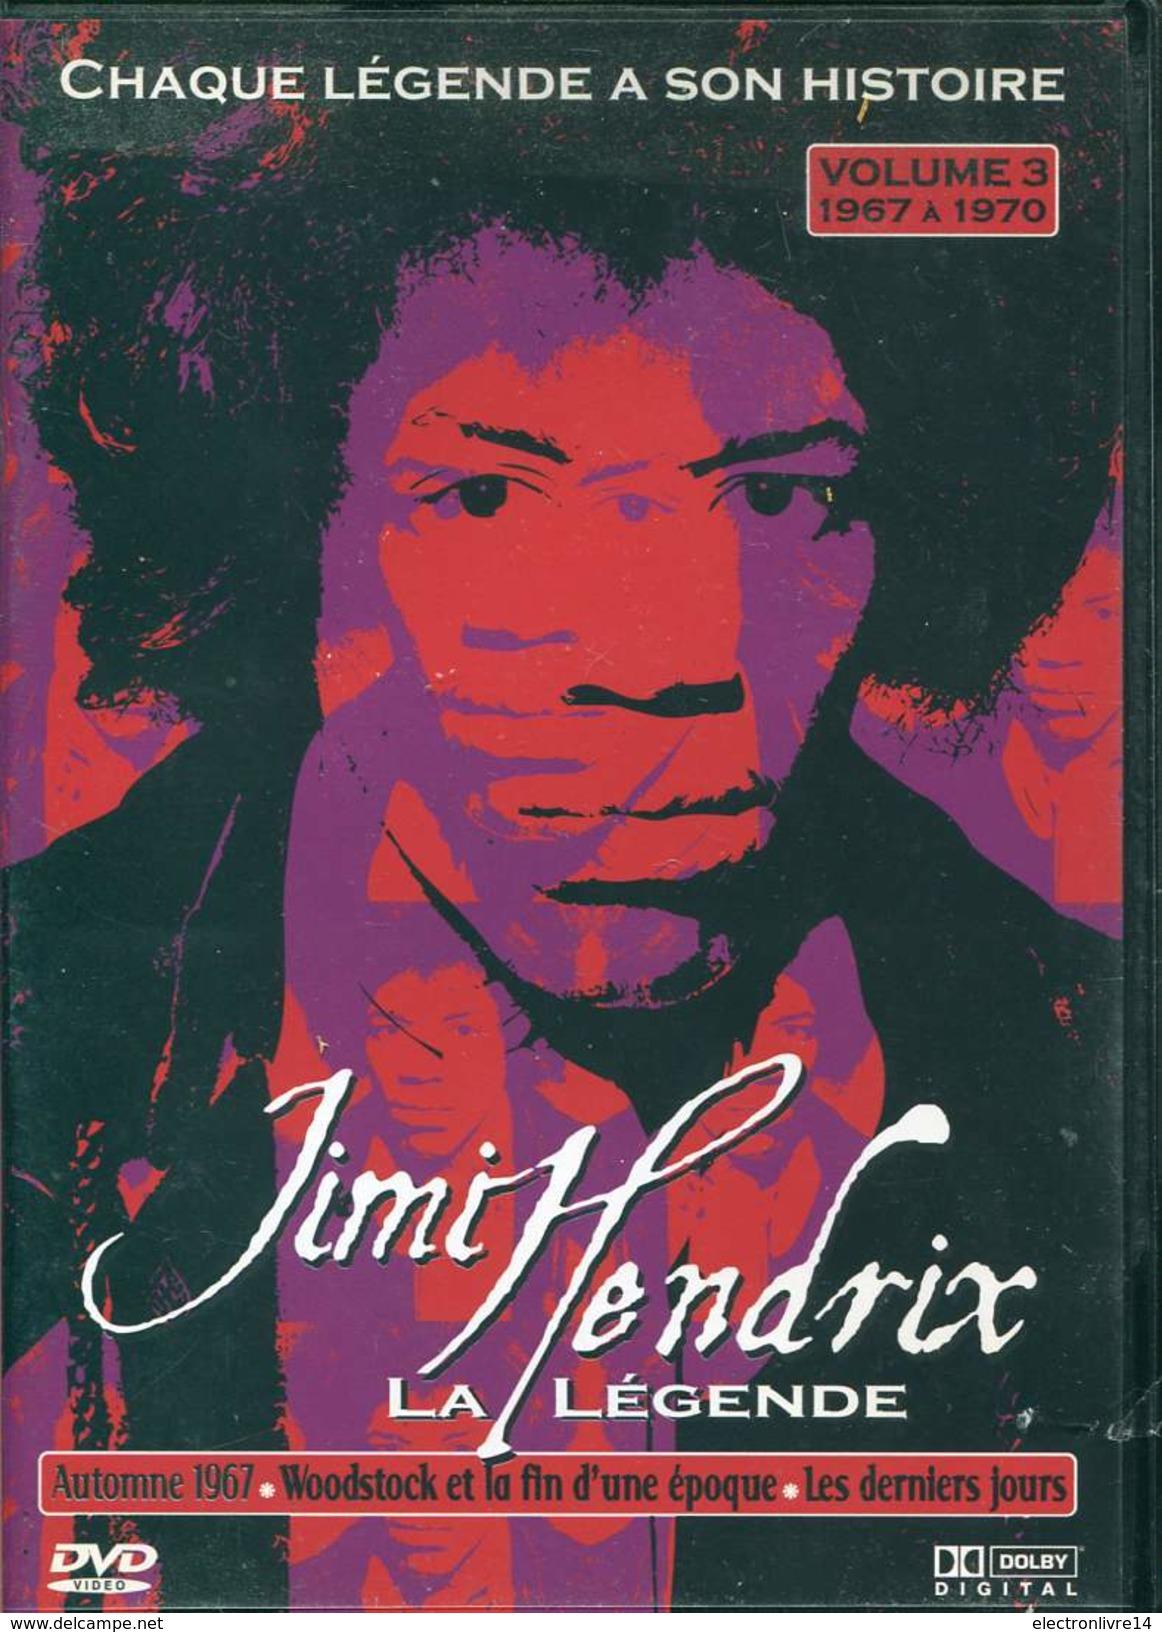 3 Dvd Complet Documentaire Jimy Hendrix La Legende Vf Vostf - Musik-DVD's